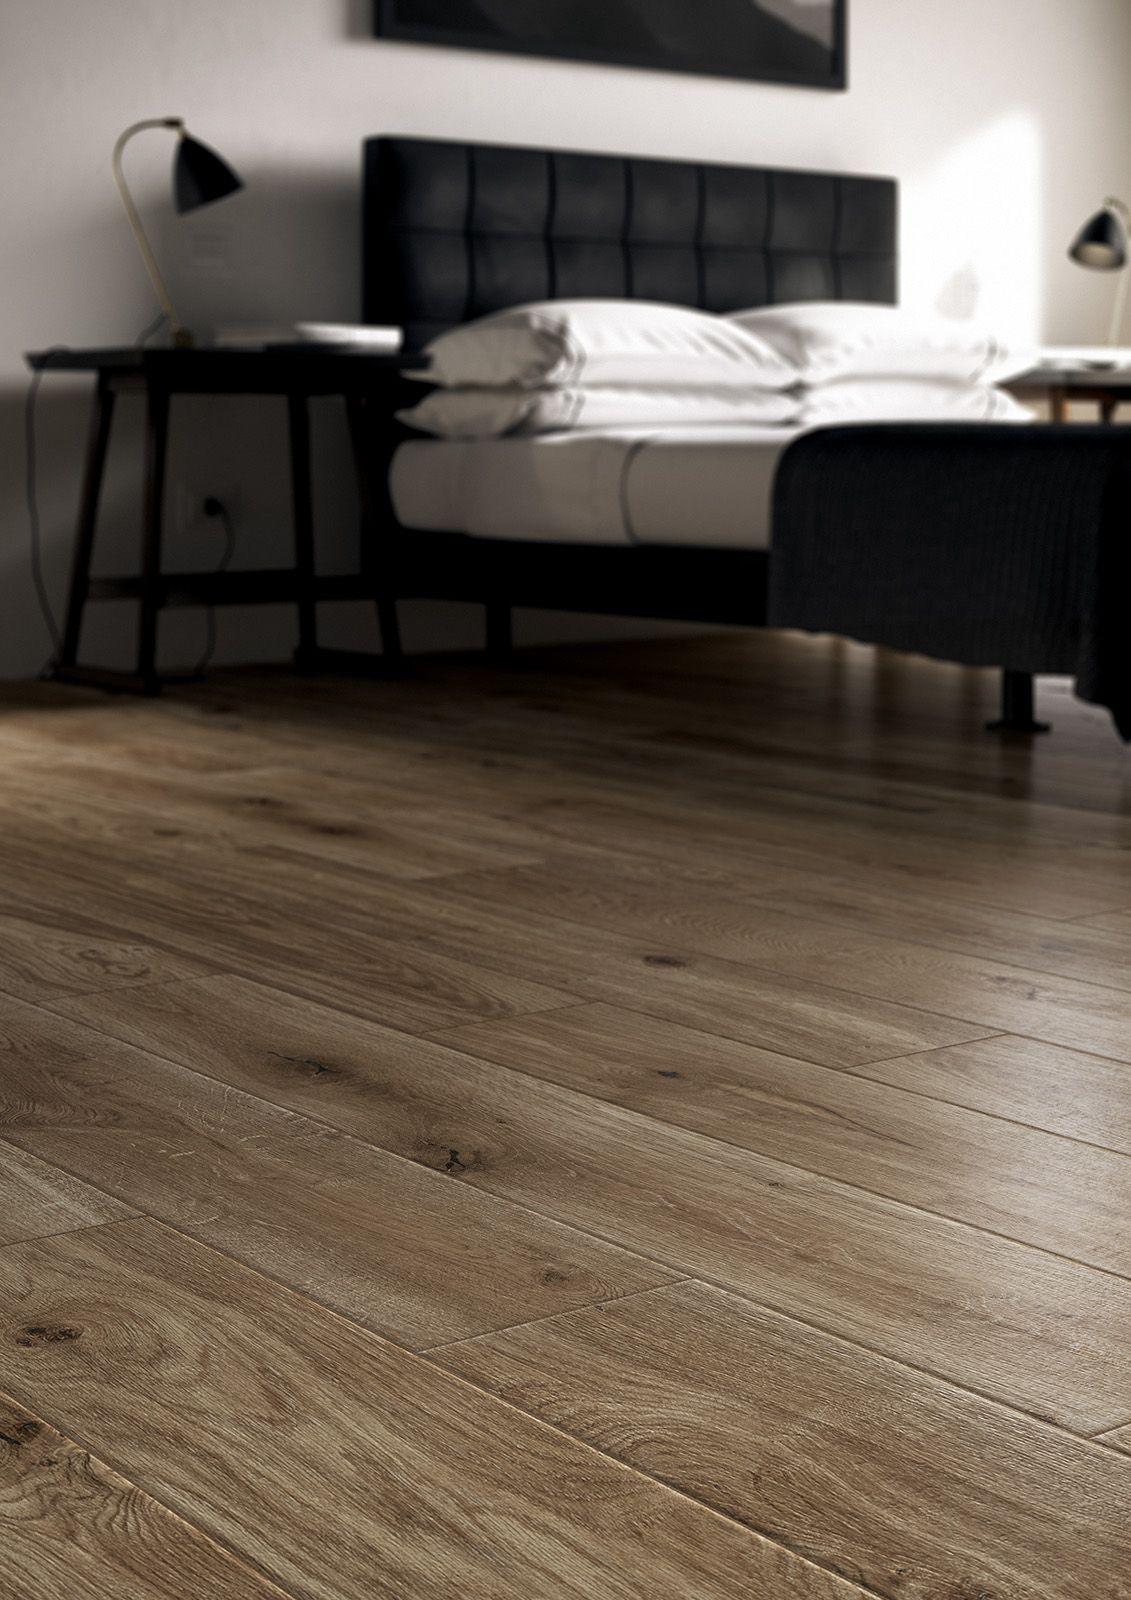 Mattonelle Simil Parquet Prezzi marazzi treverkever musk | timber look tile | available at